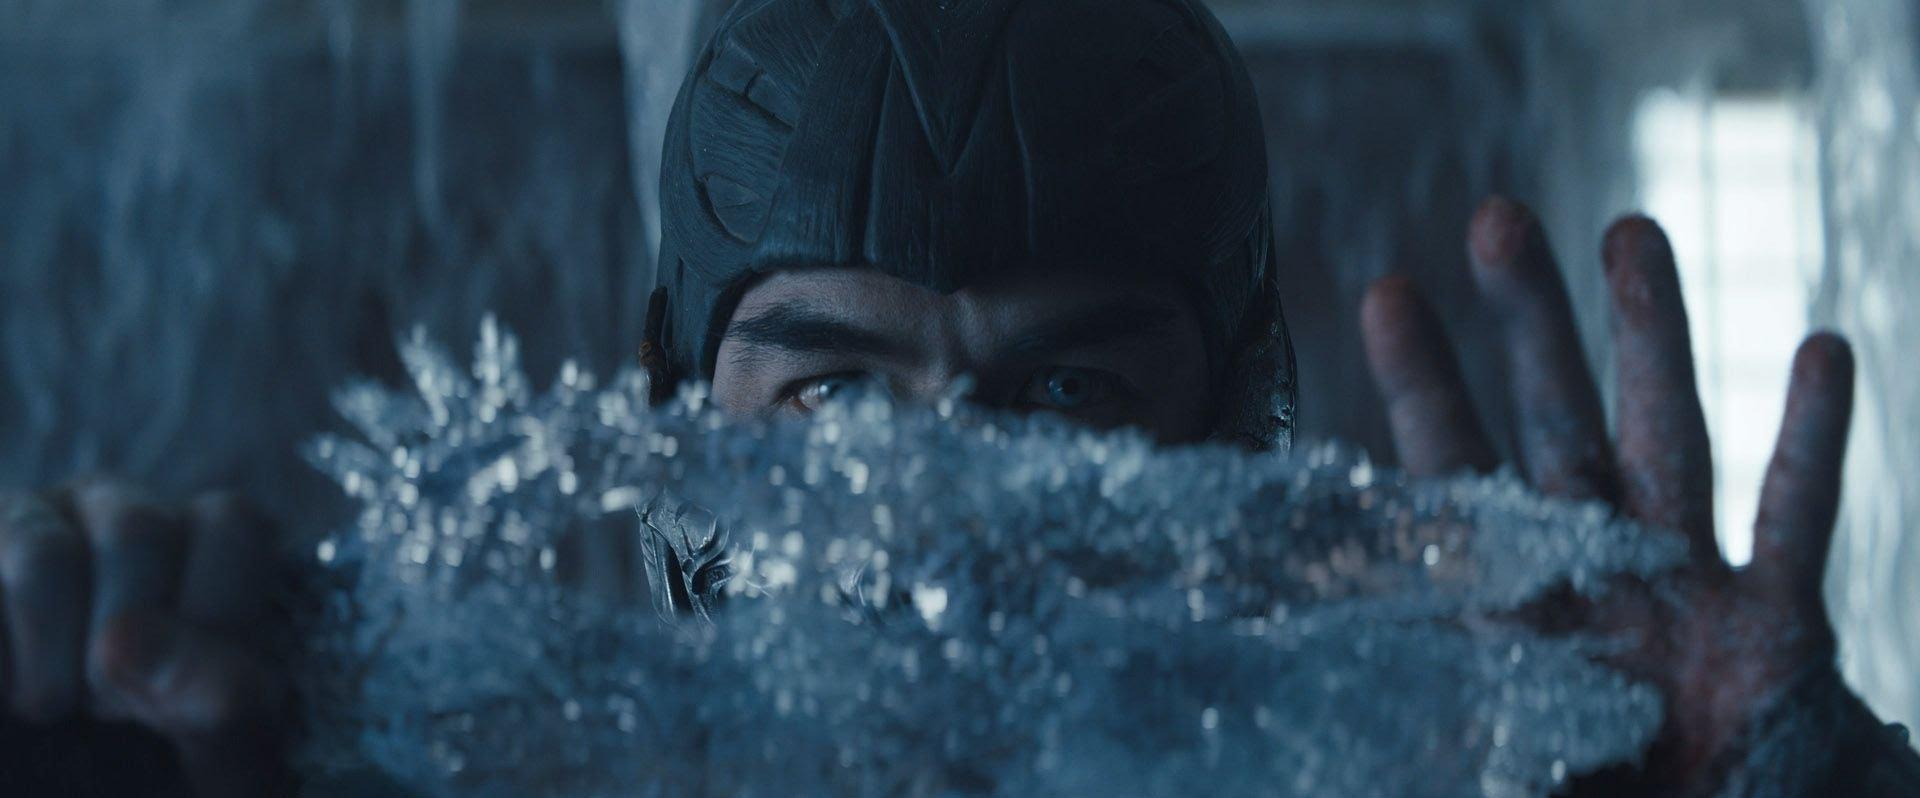 Joe Taslim as Sub-Zero in Mortal Kombat (2021)